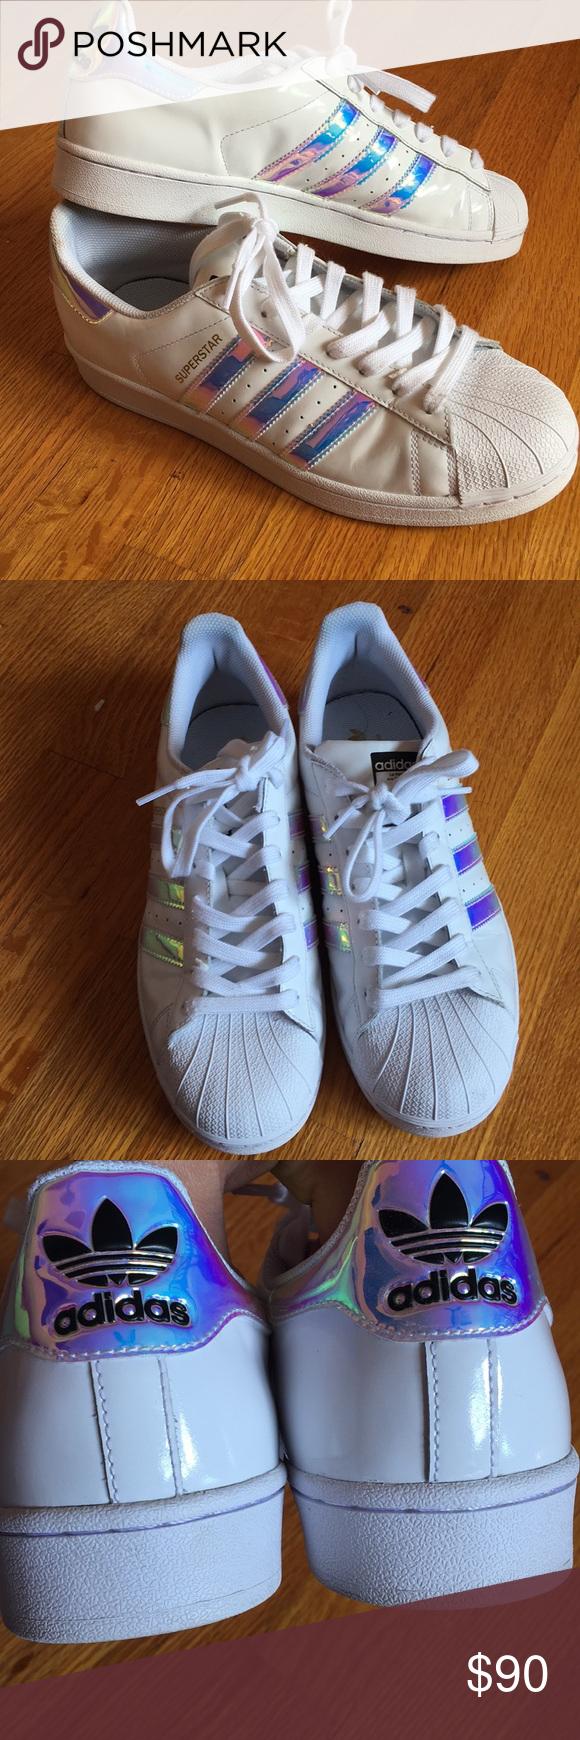 adidas iridescente bianco super star scarpe pinterest